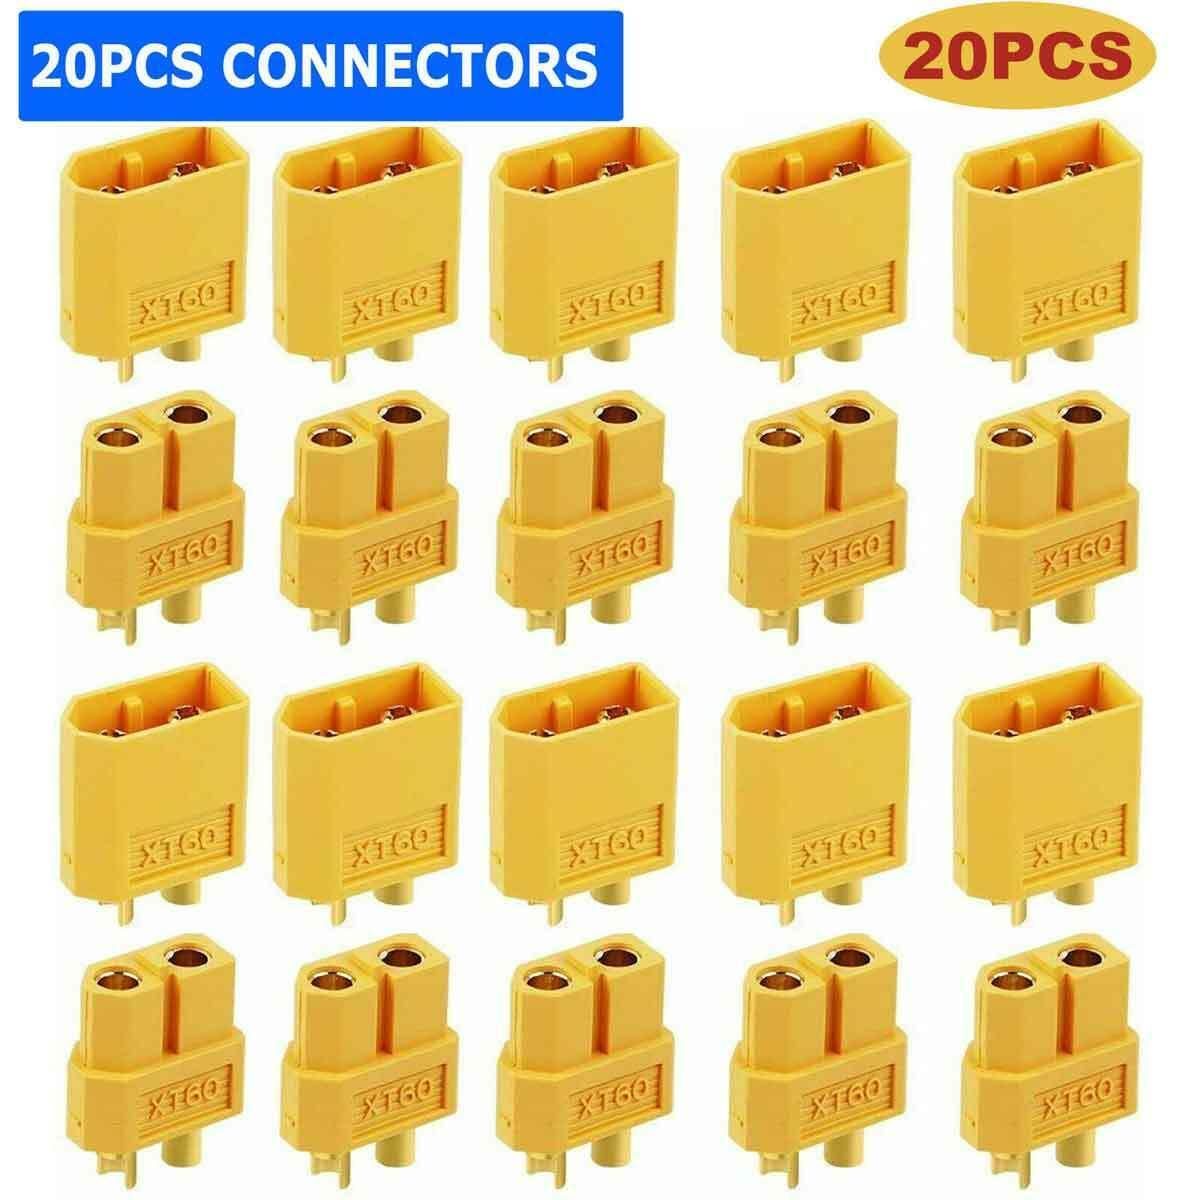 10Pairs XT-60 XT60 Male Female Bullet Connectors RC Lipo Power Plugs Nylon Other RC Parts & Accs